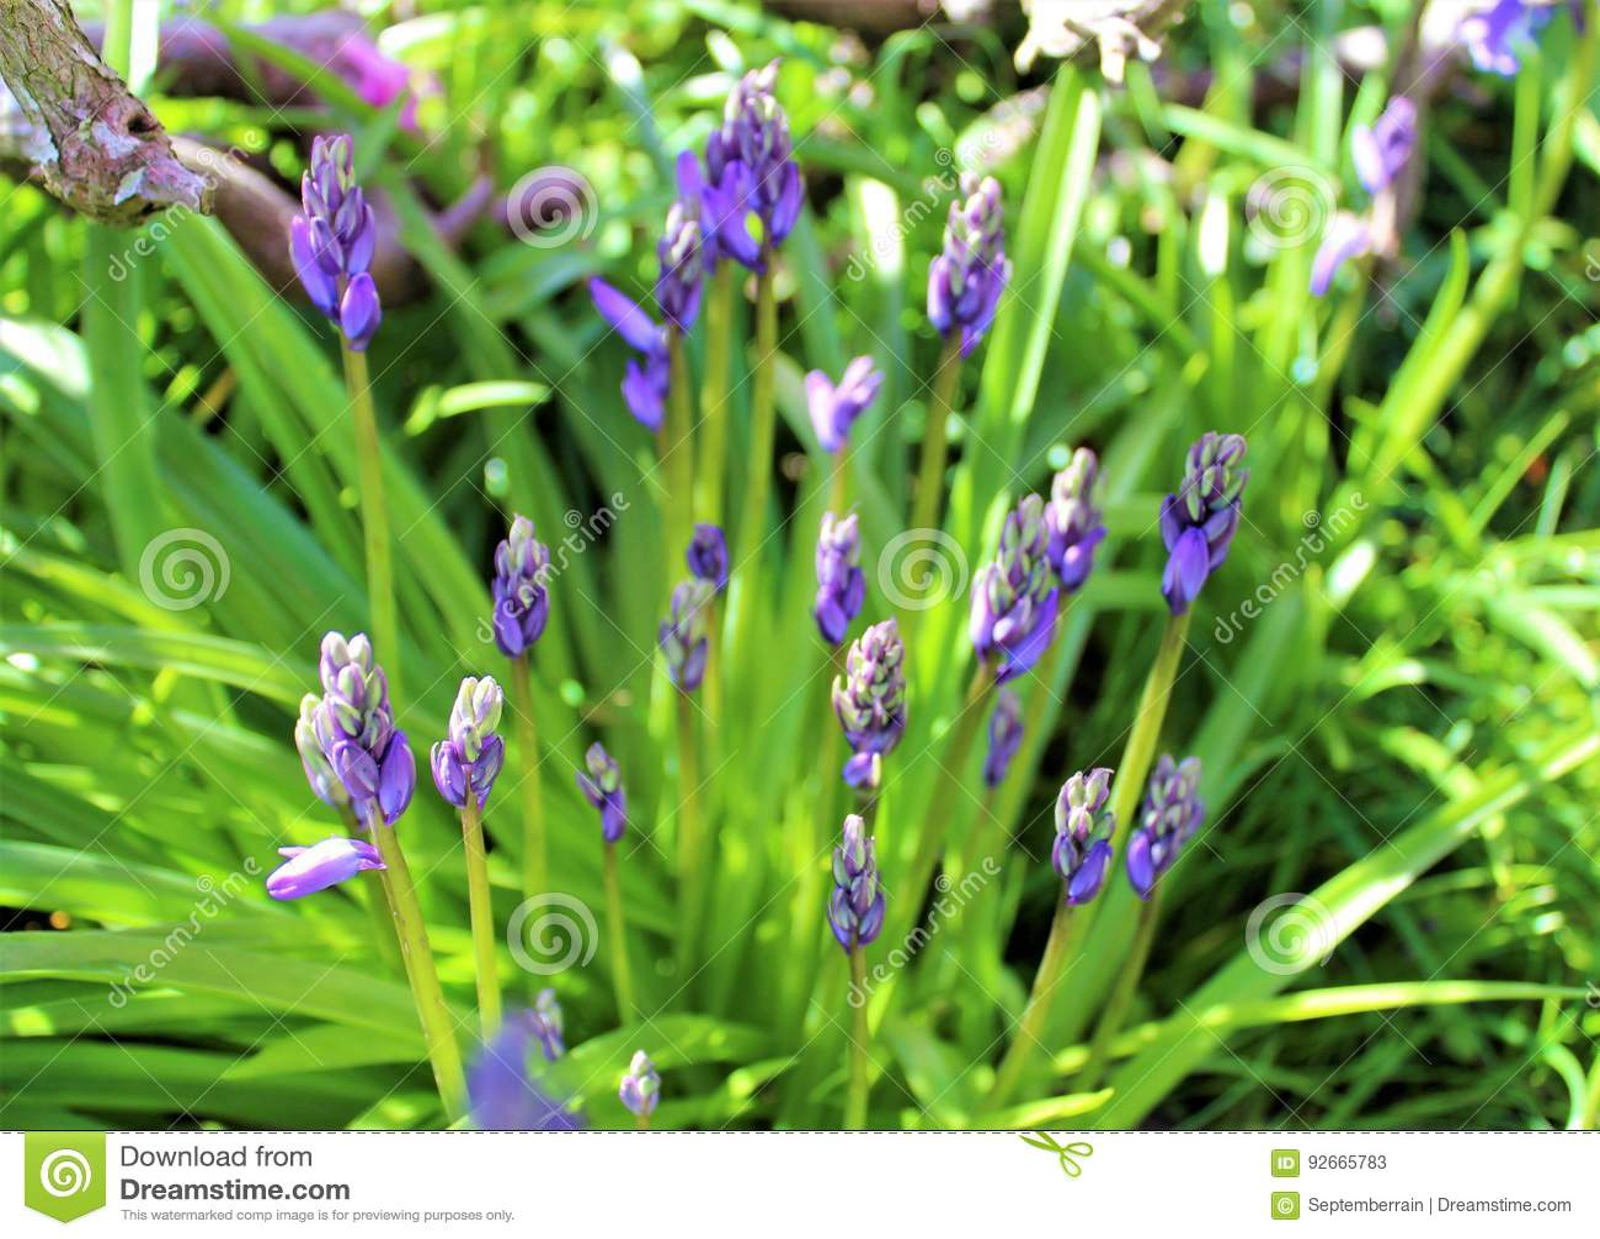 Blueish bell flowers bloom in late spring stock image image of download blueish bell flowers bloom in late spring stock image image of bees fragrant mightylinksfo